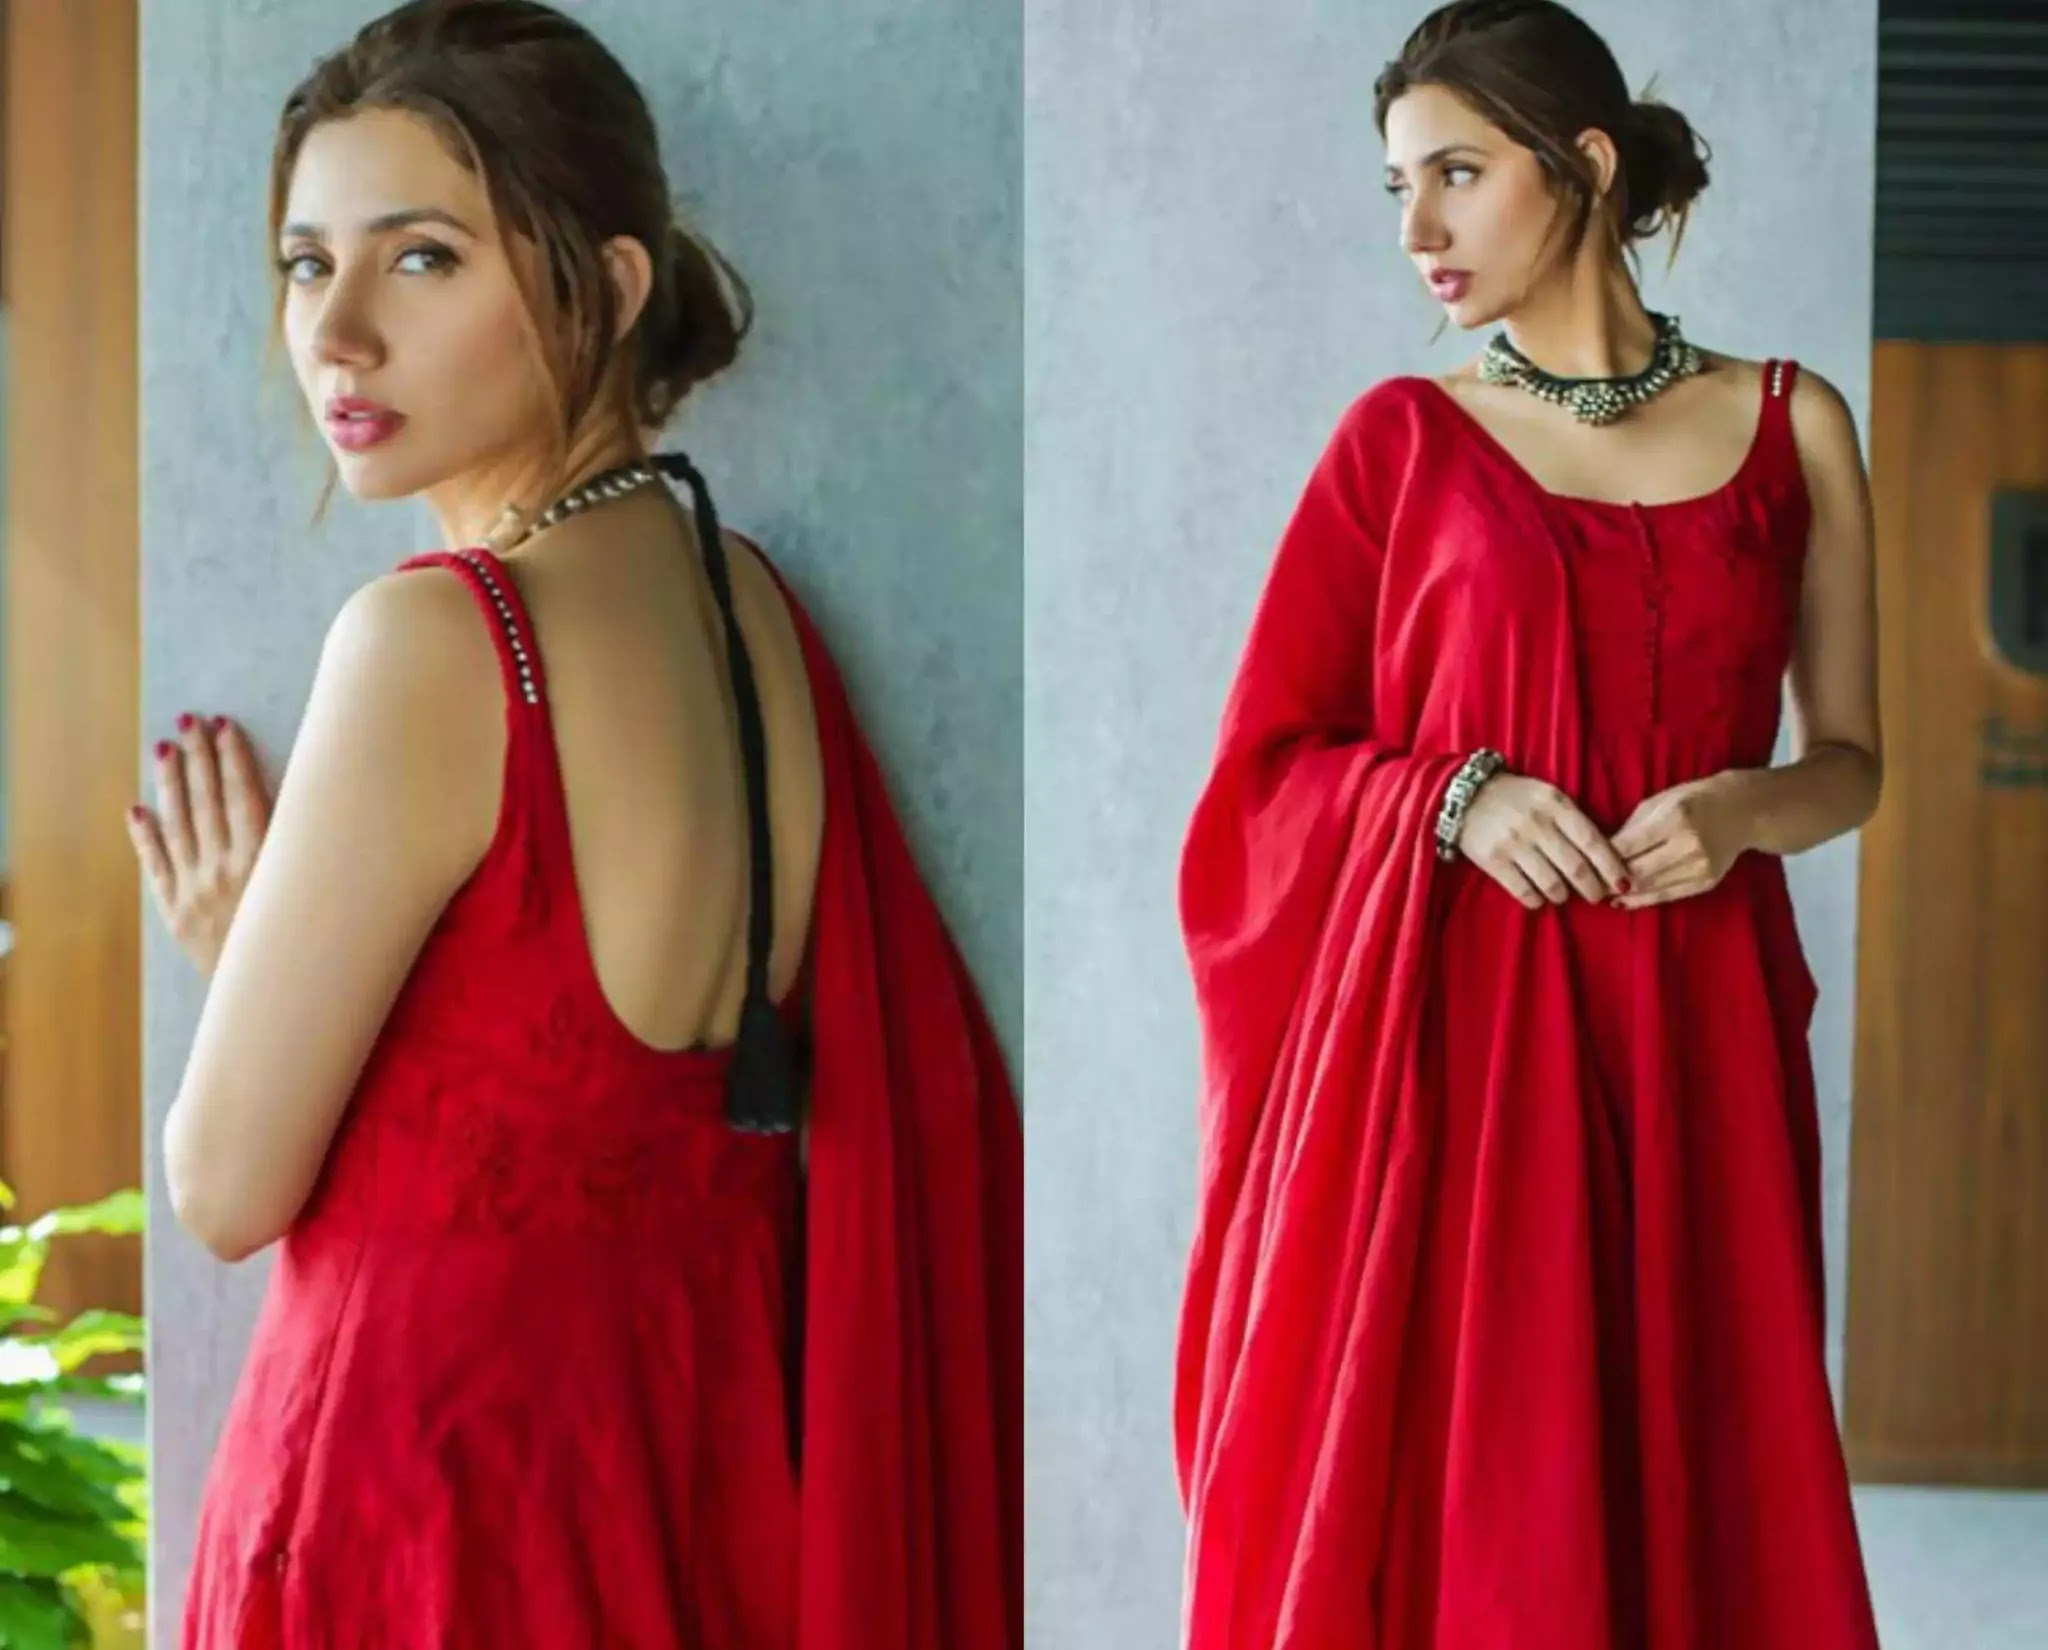 Beautiful Pictures of Mahira Khan Wearing Red Frock